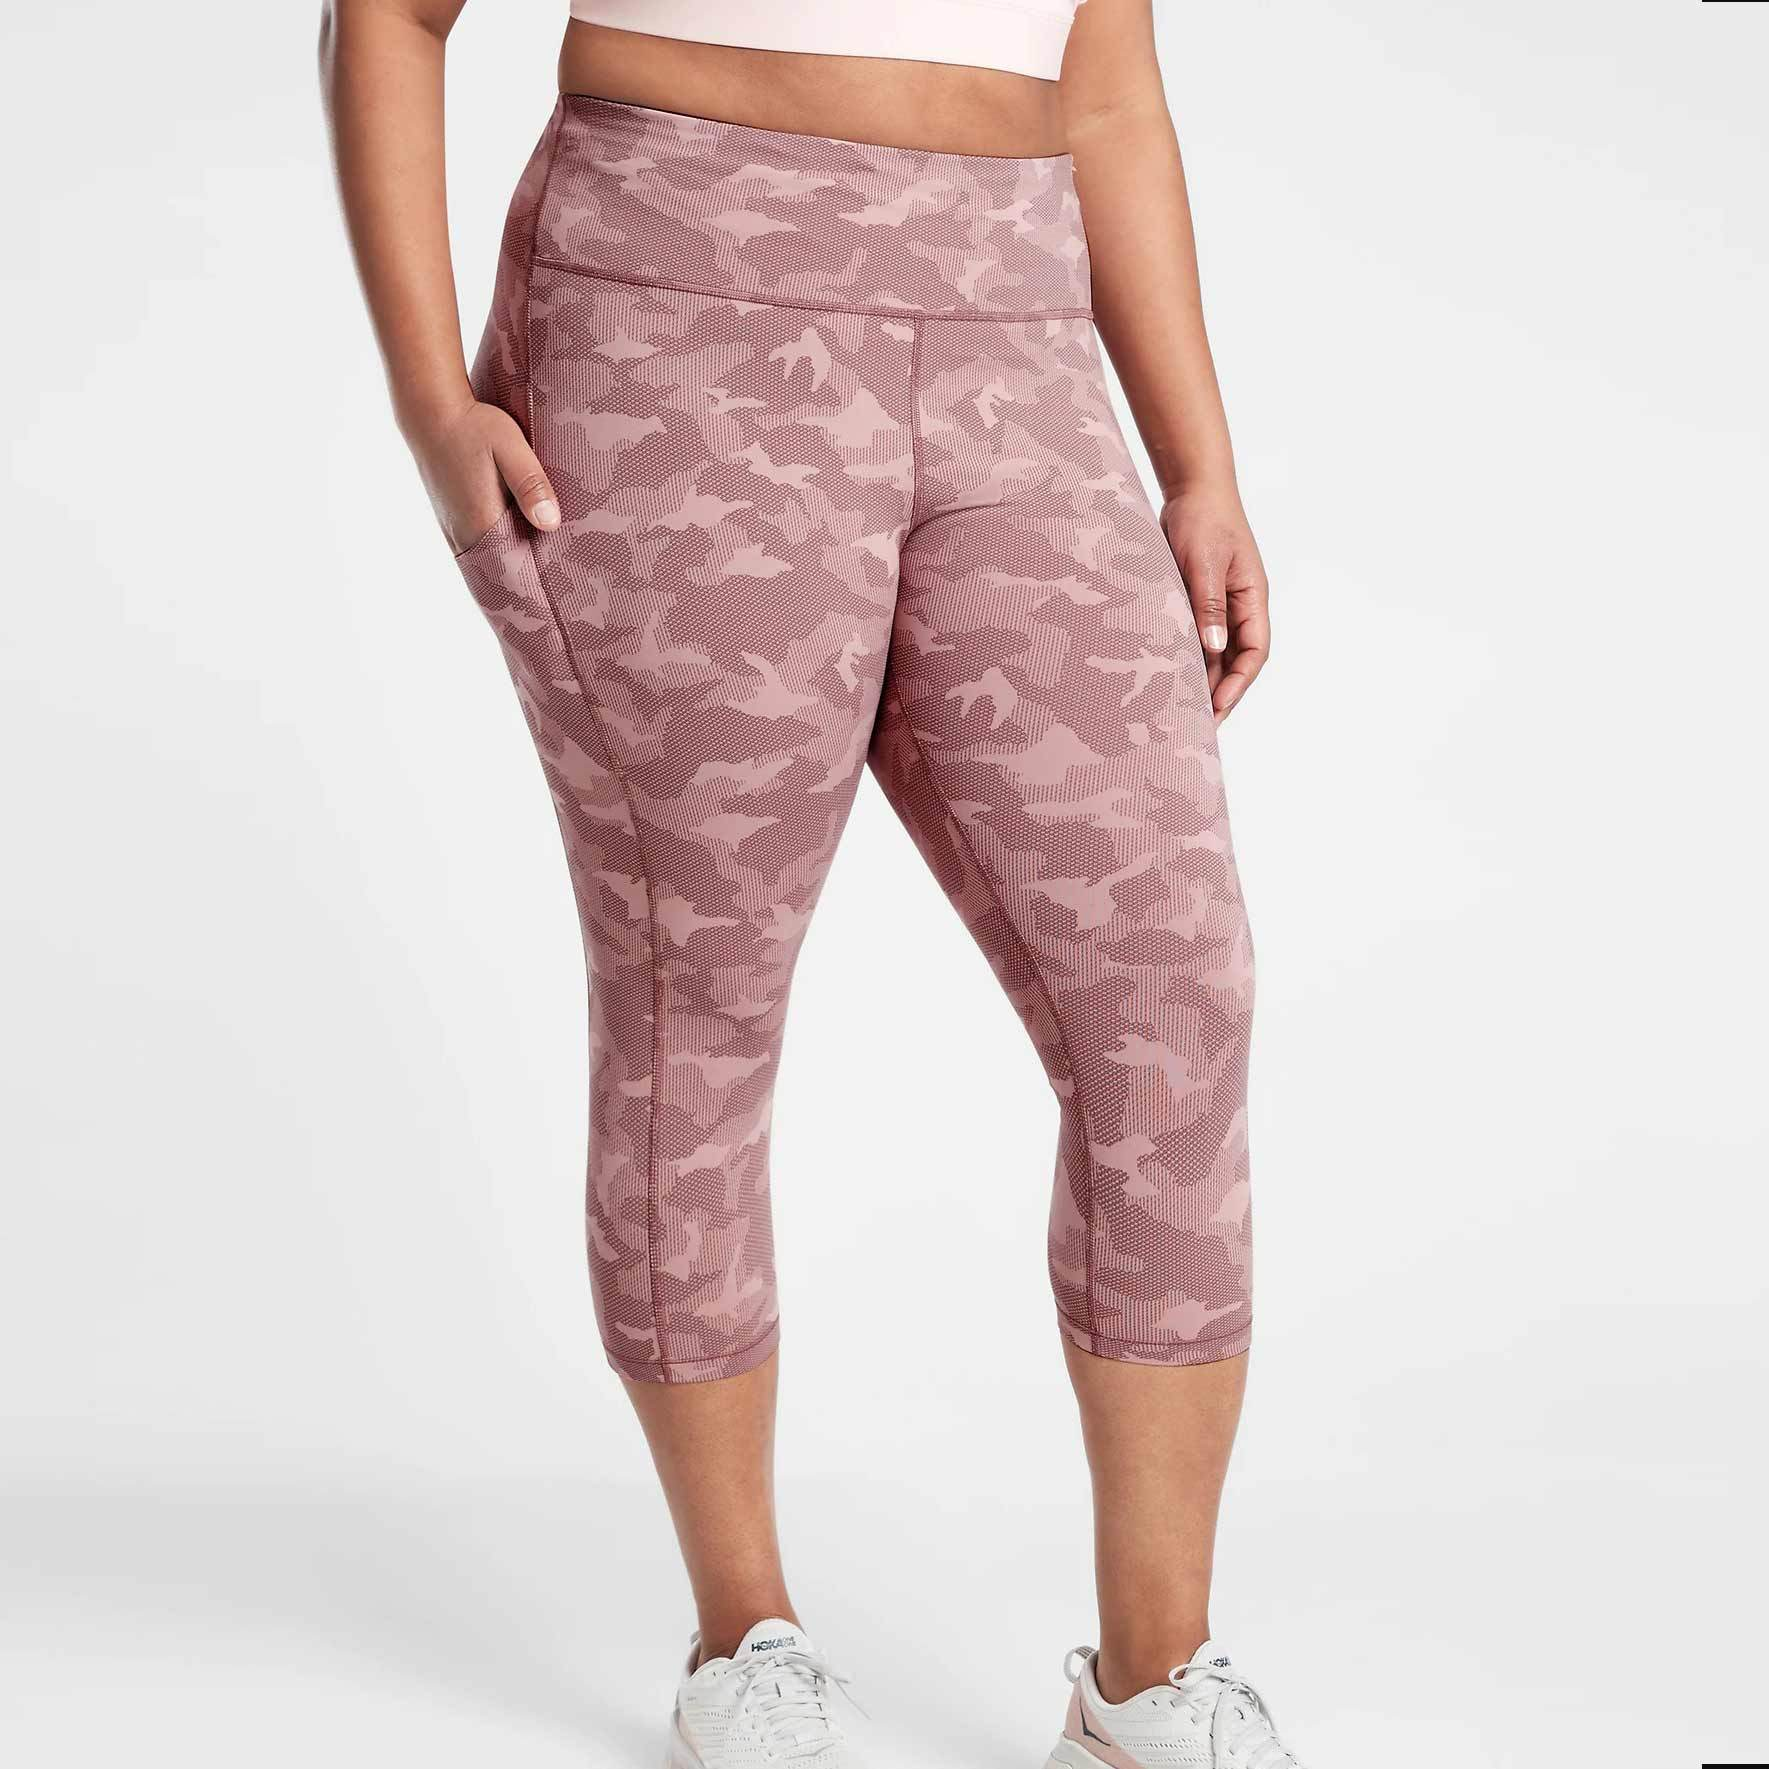 plus size compression legging